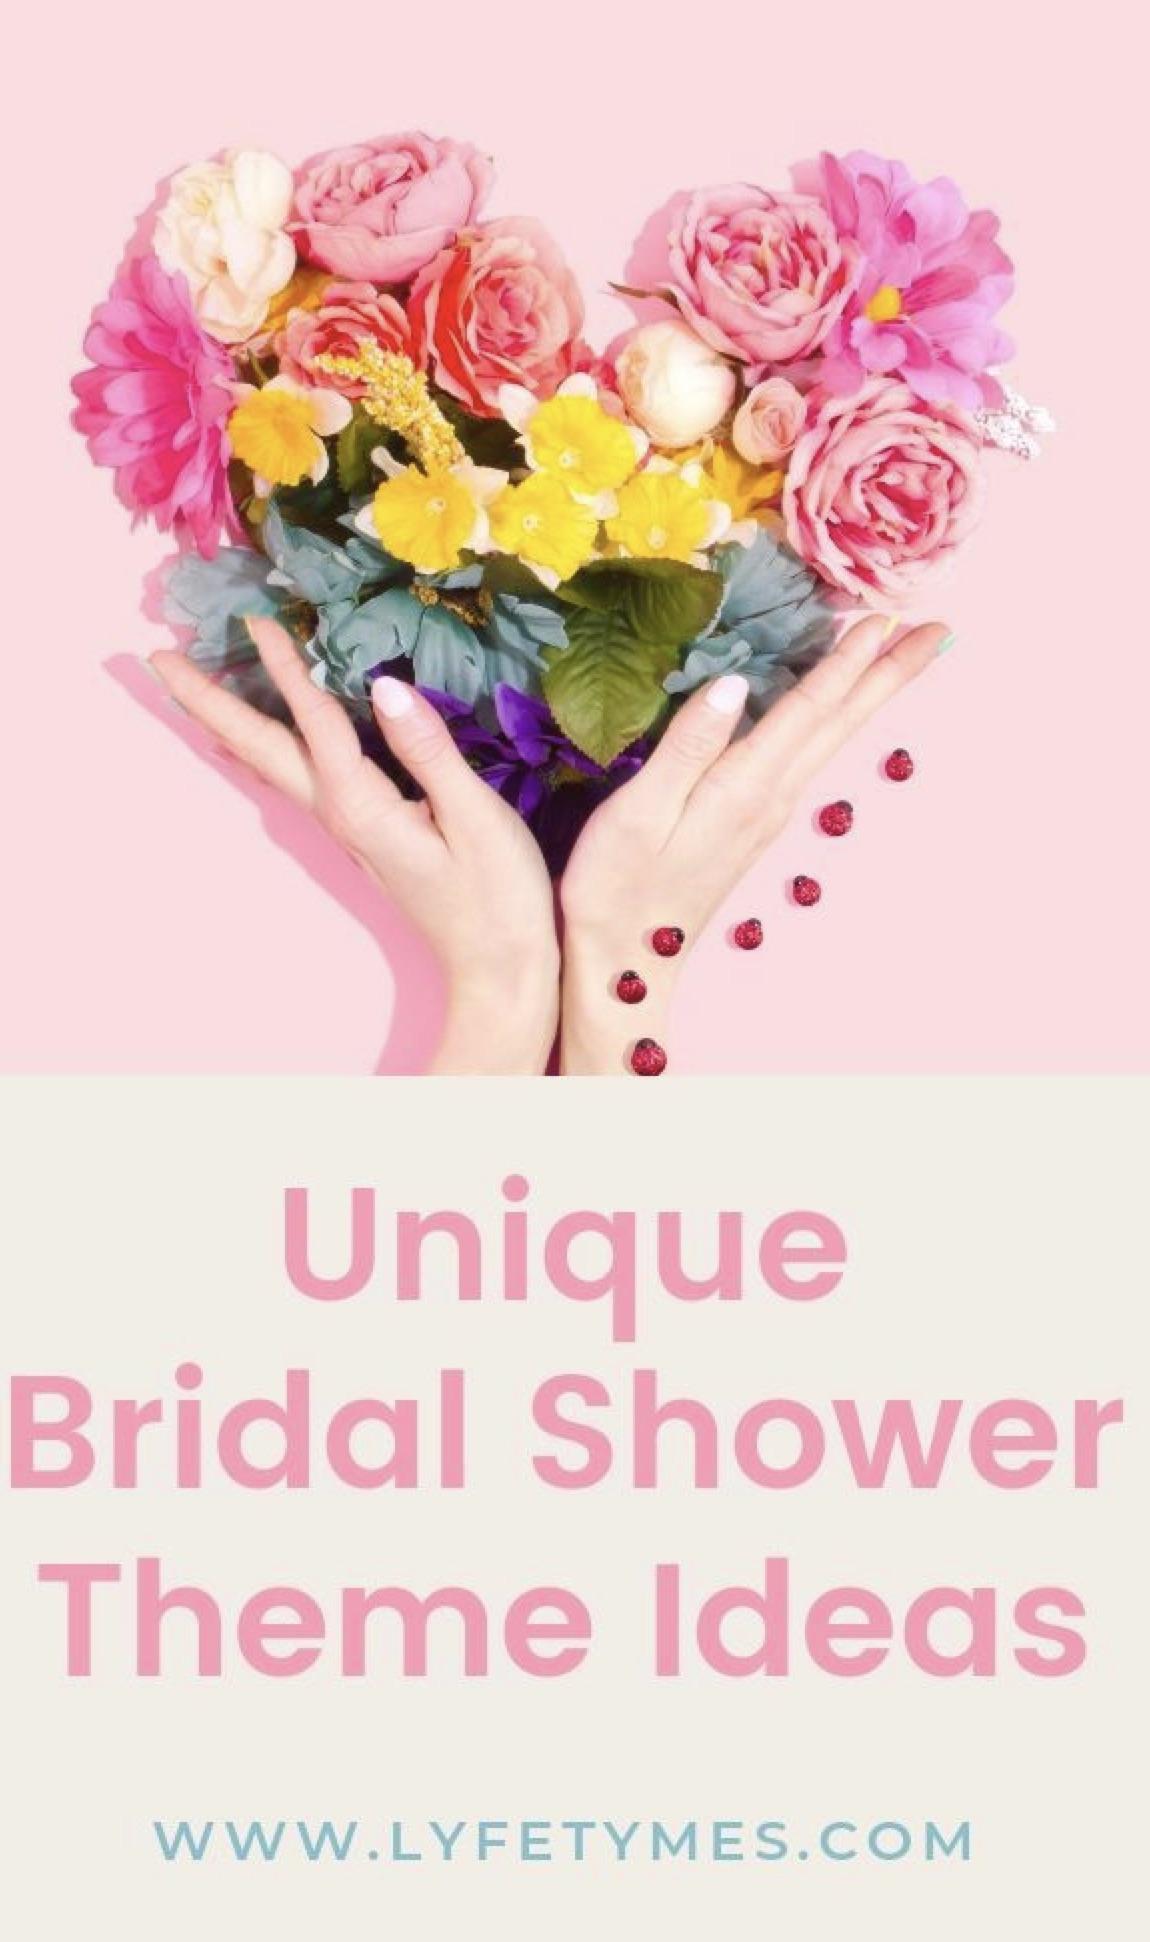 Plan a Bridal Shower